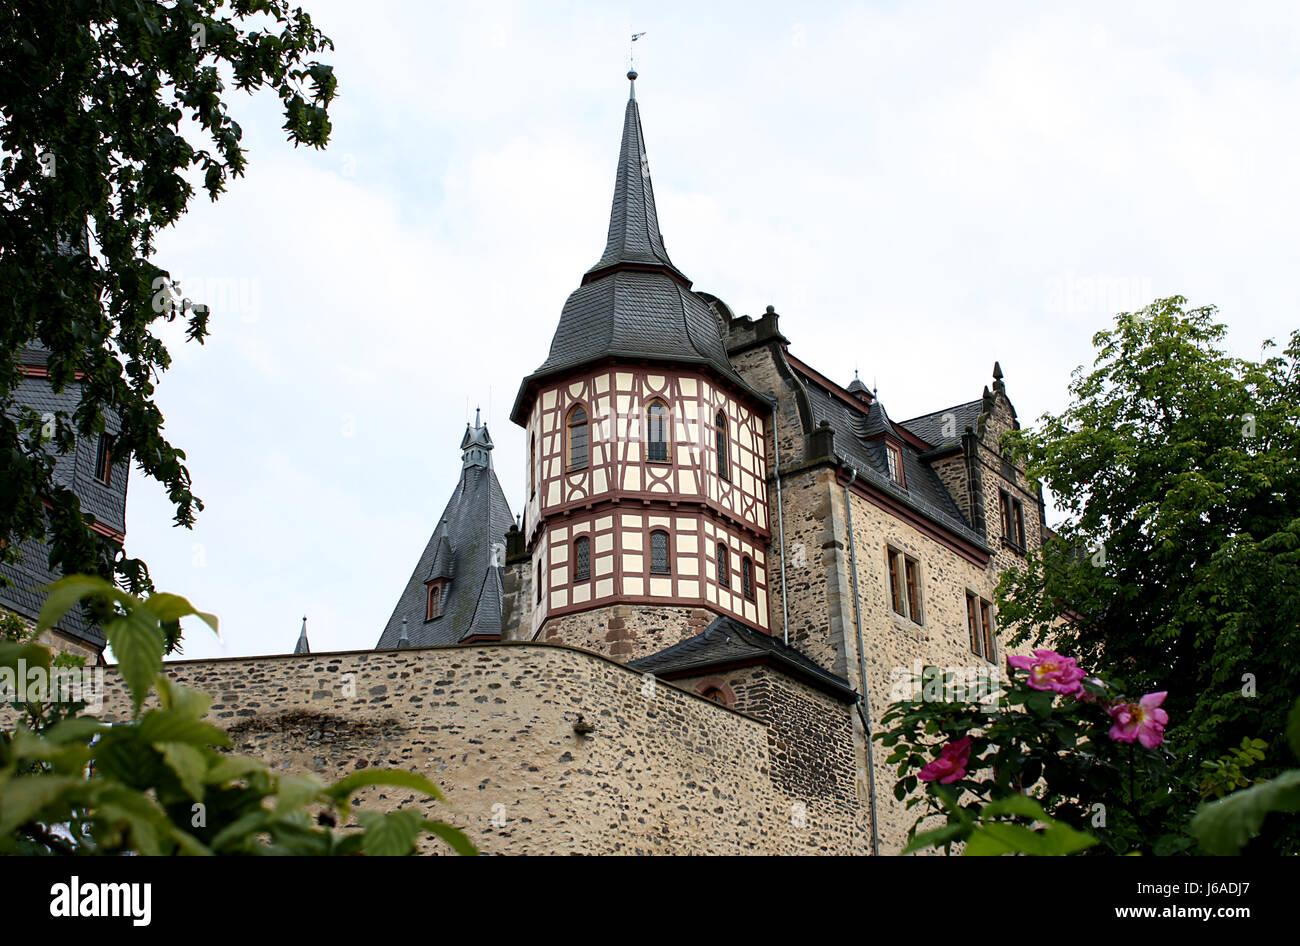 Turm-Rahmenarbeit Wachturm Schloss Burg Turm Baum Stein Fenster ...